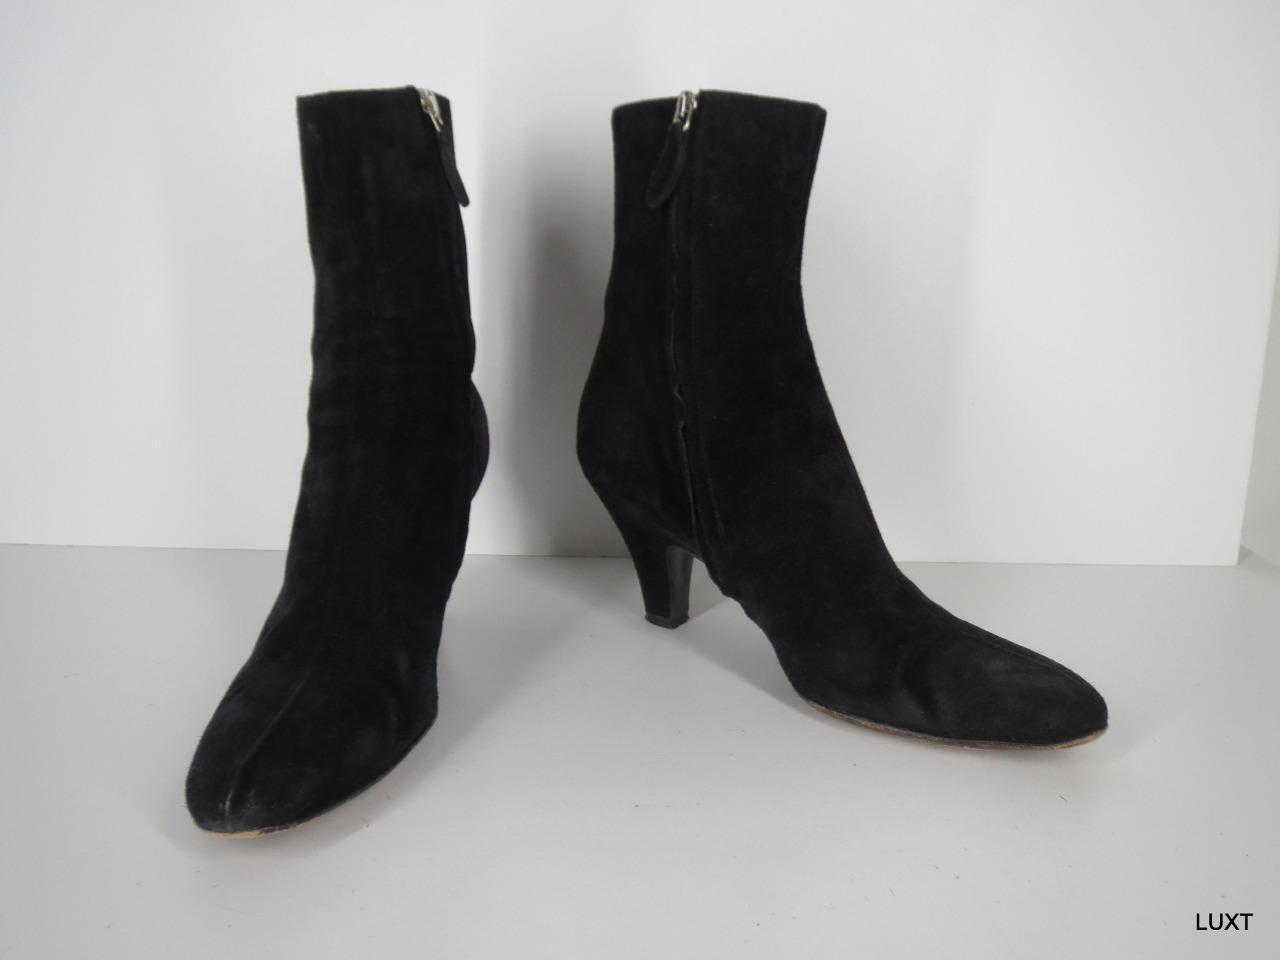 Jil Sander Ankle Boots Booties $750 Size 8 38 Suede Black Silver Stripe Side Zip